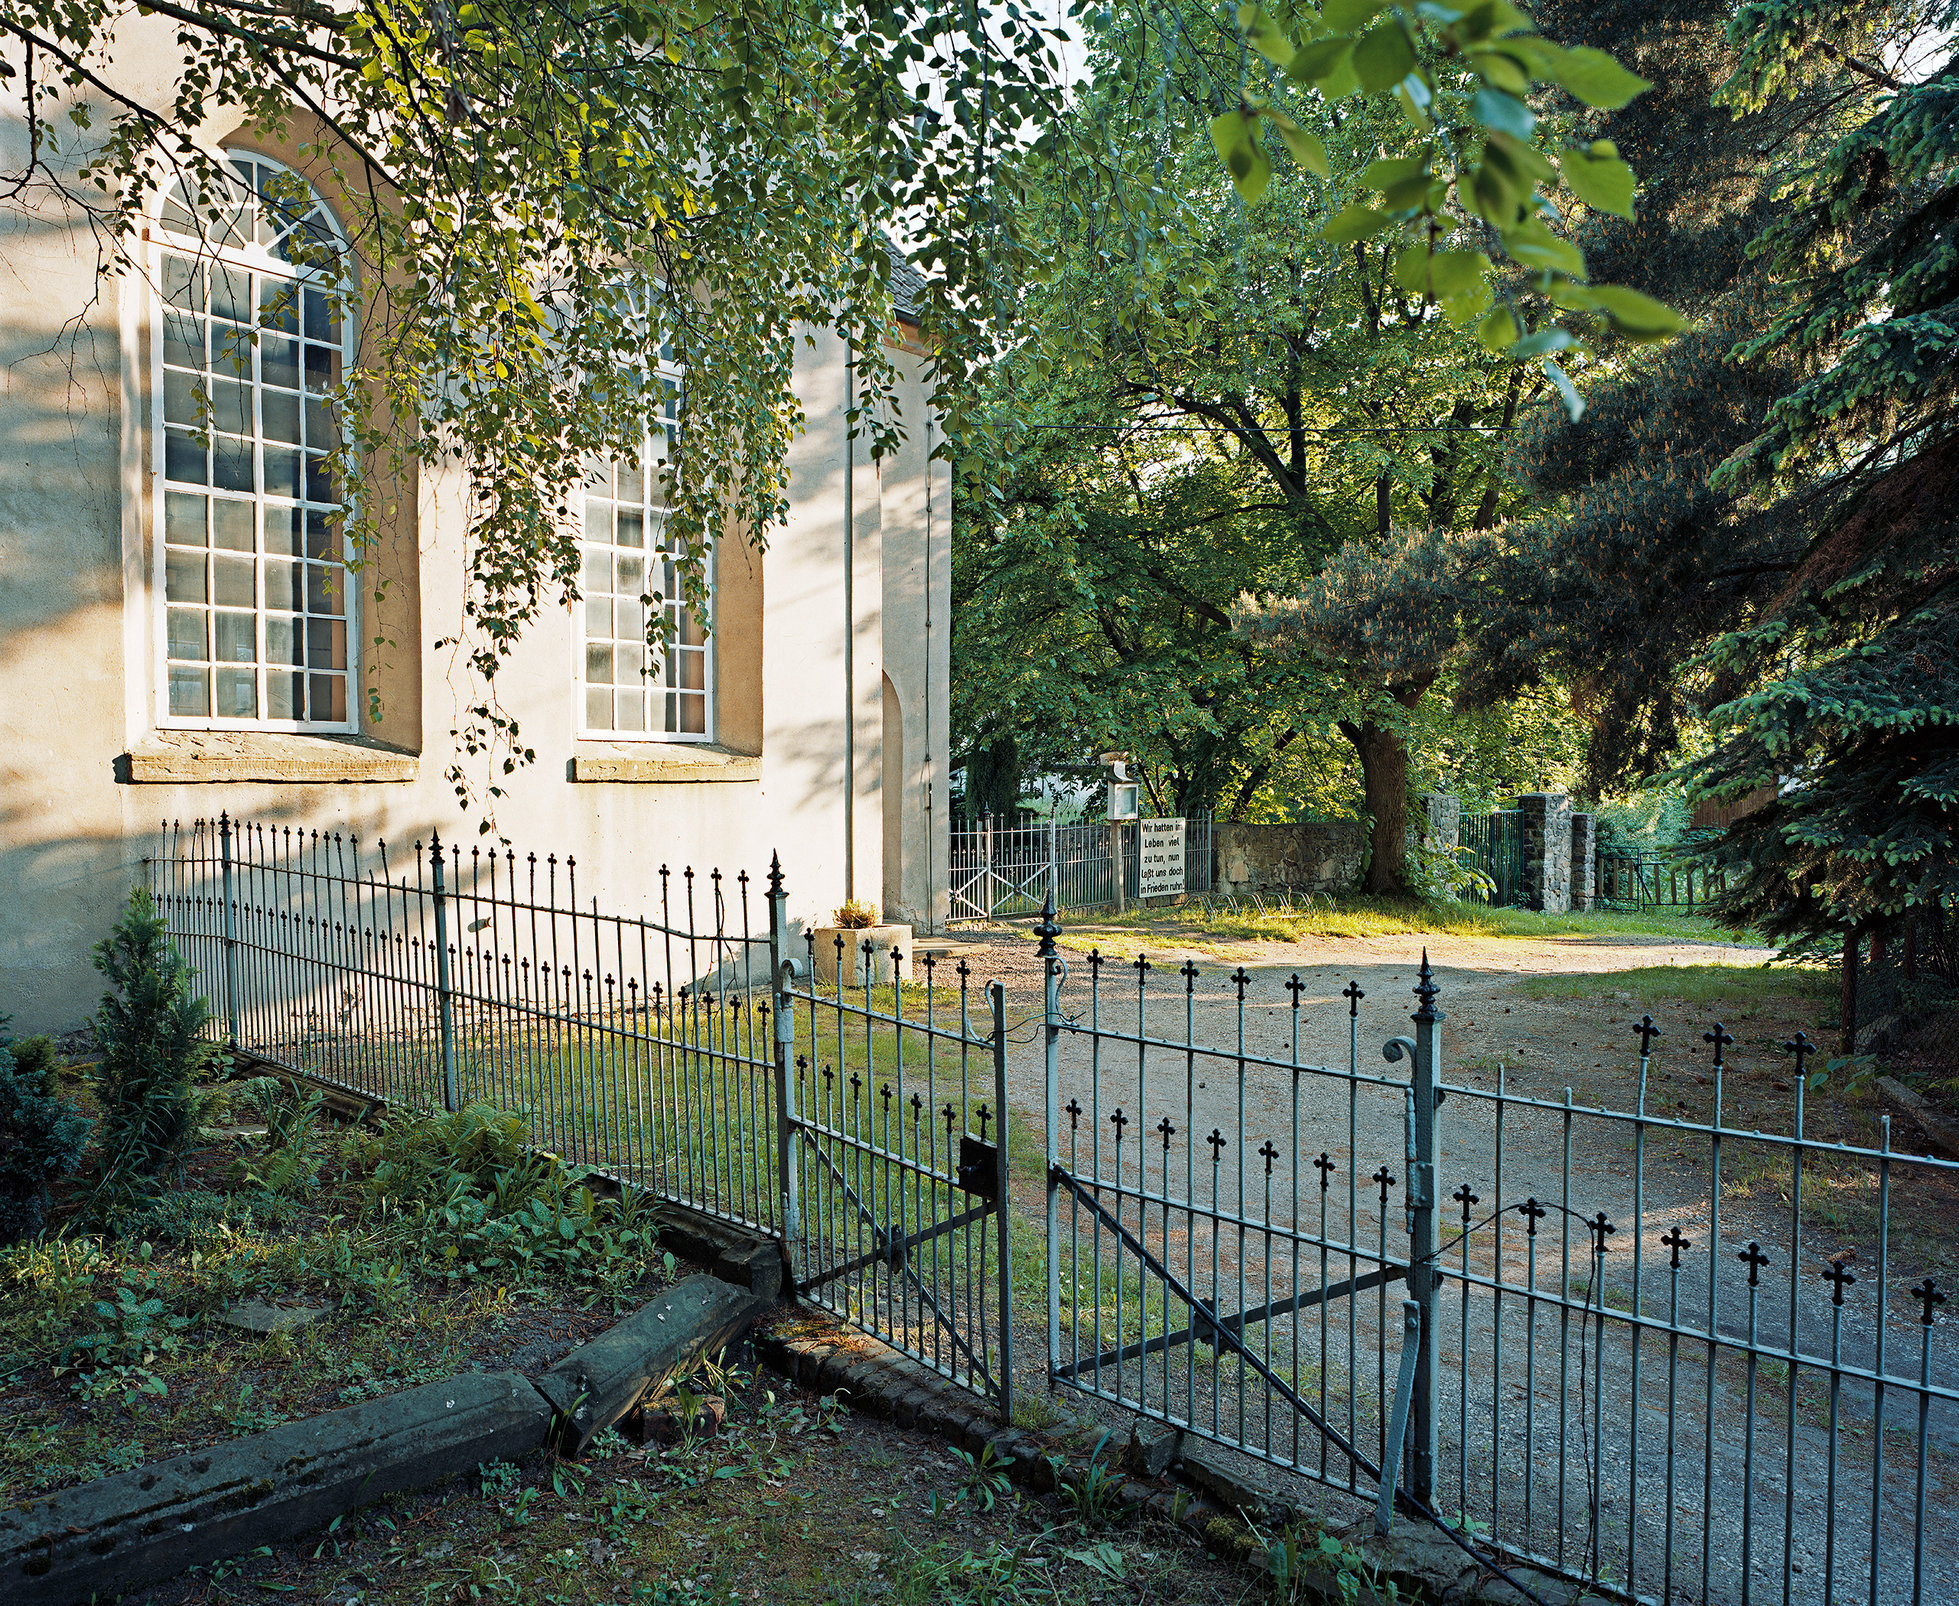 Tabor Church, Heuersdorf